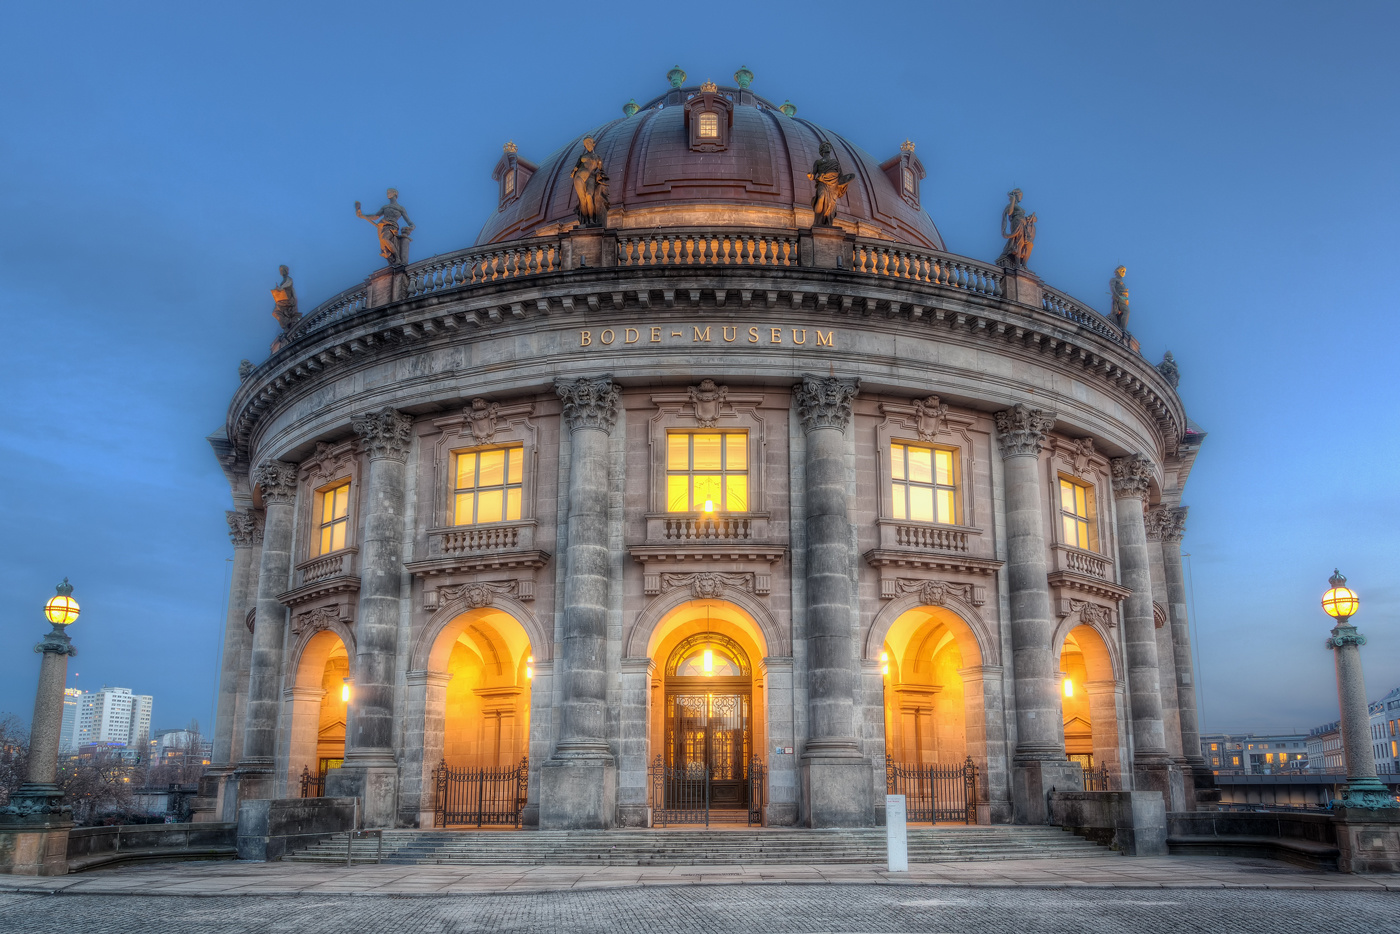 Bode Museum | Berlin, Germany by Nico Trinkhaus